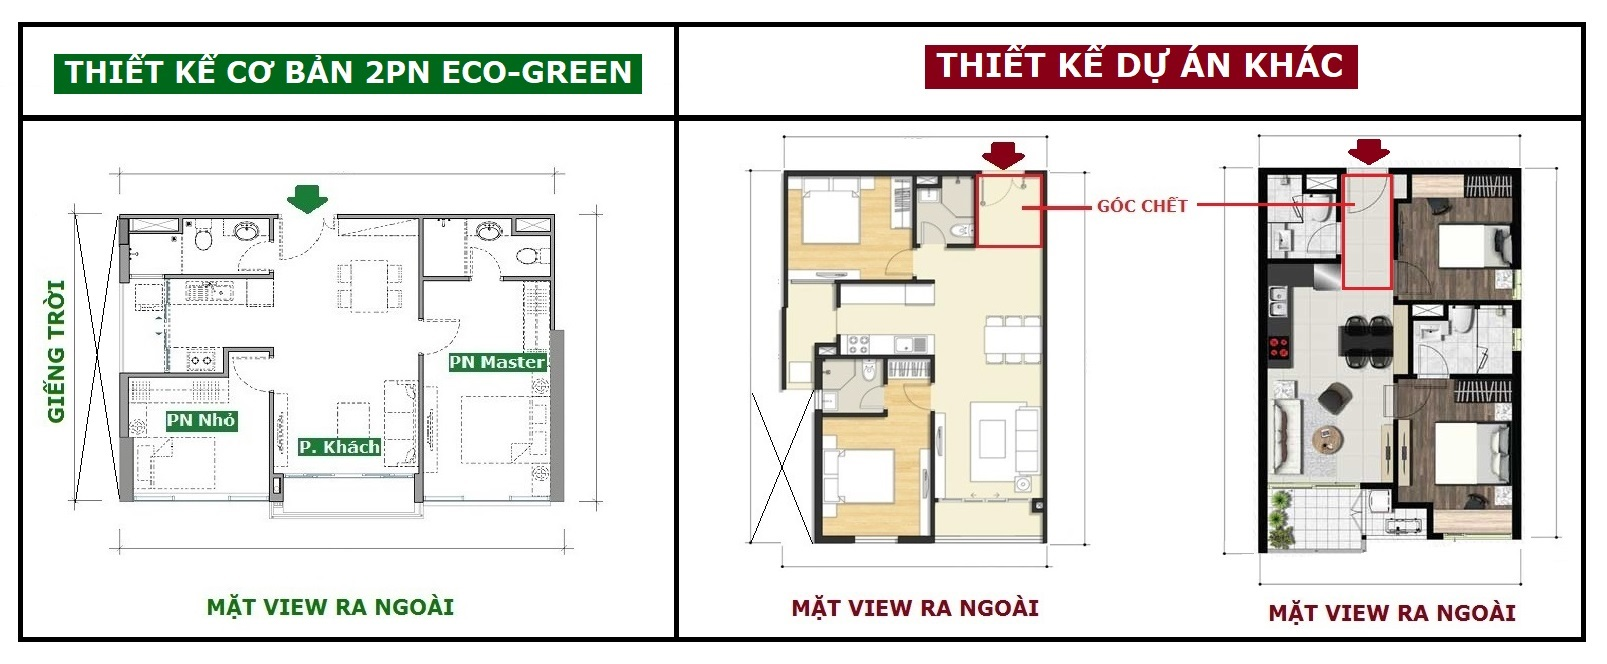 thiet-ke-thong-minh-eco-green-sai-gon